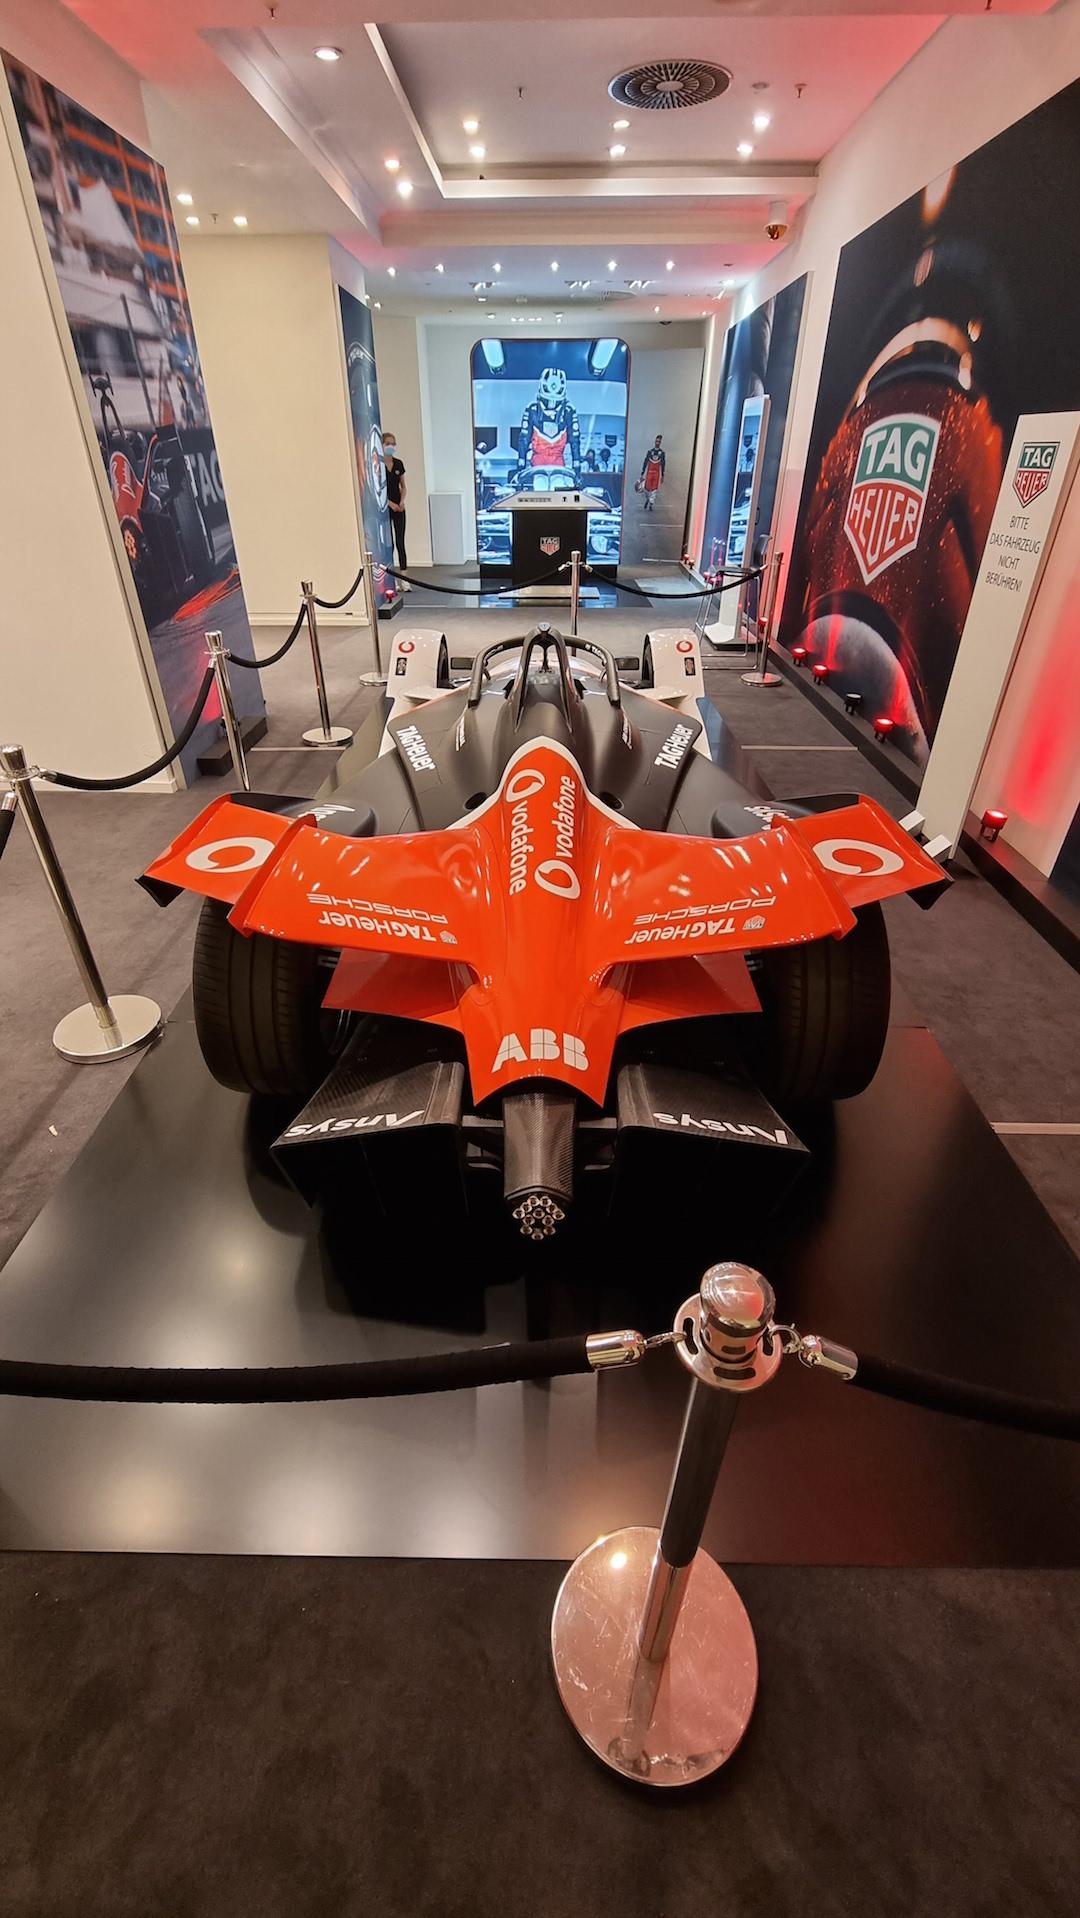 TAG Heuer Formel E 2021 - 2